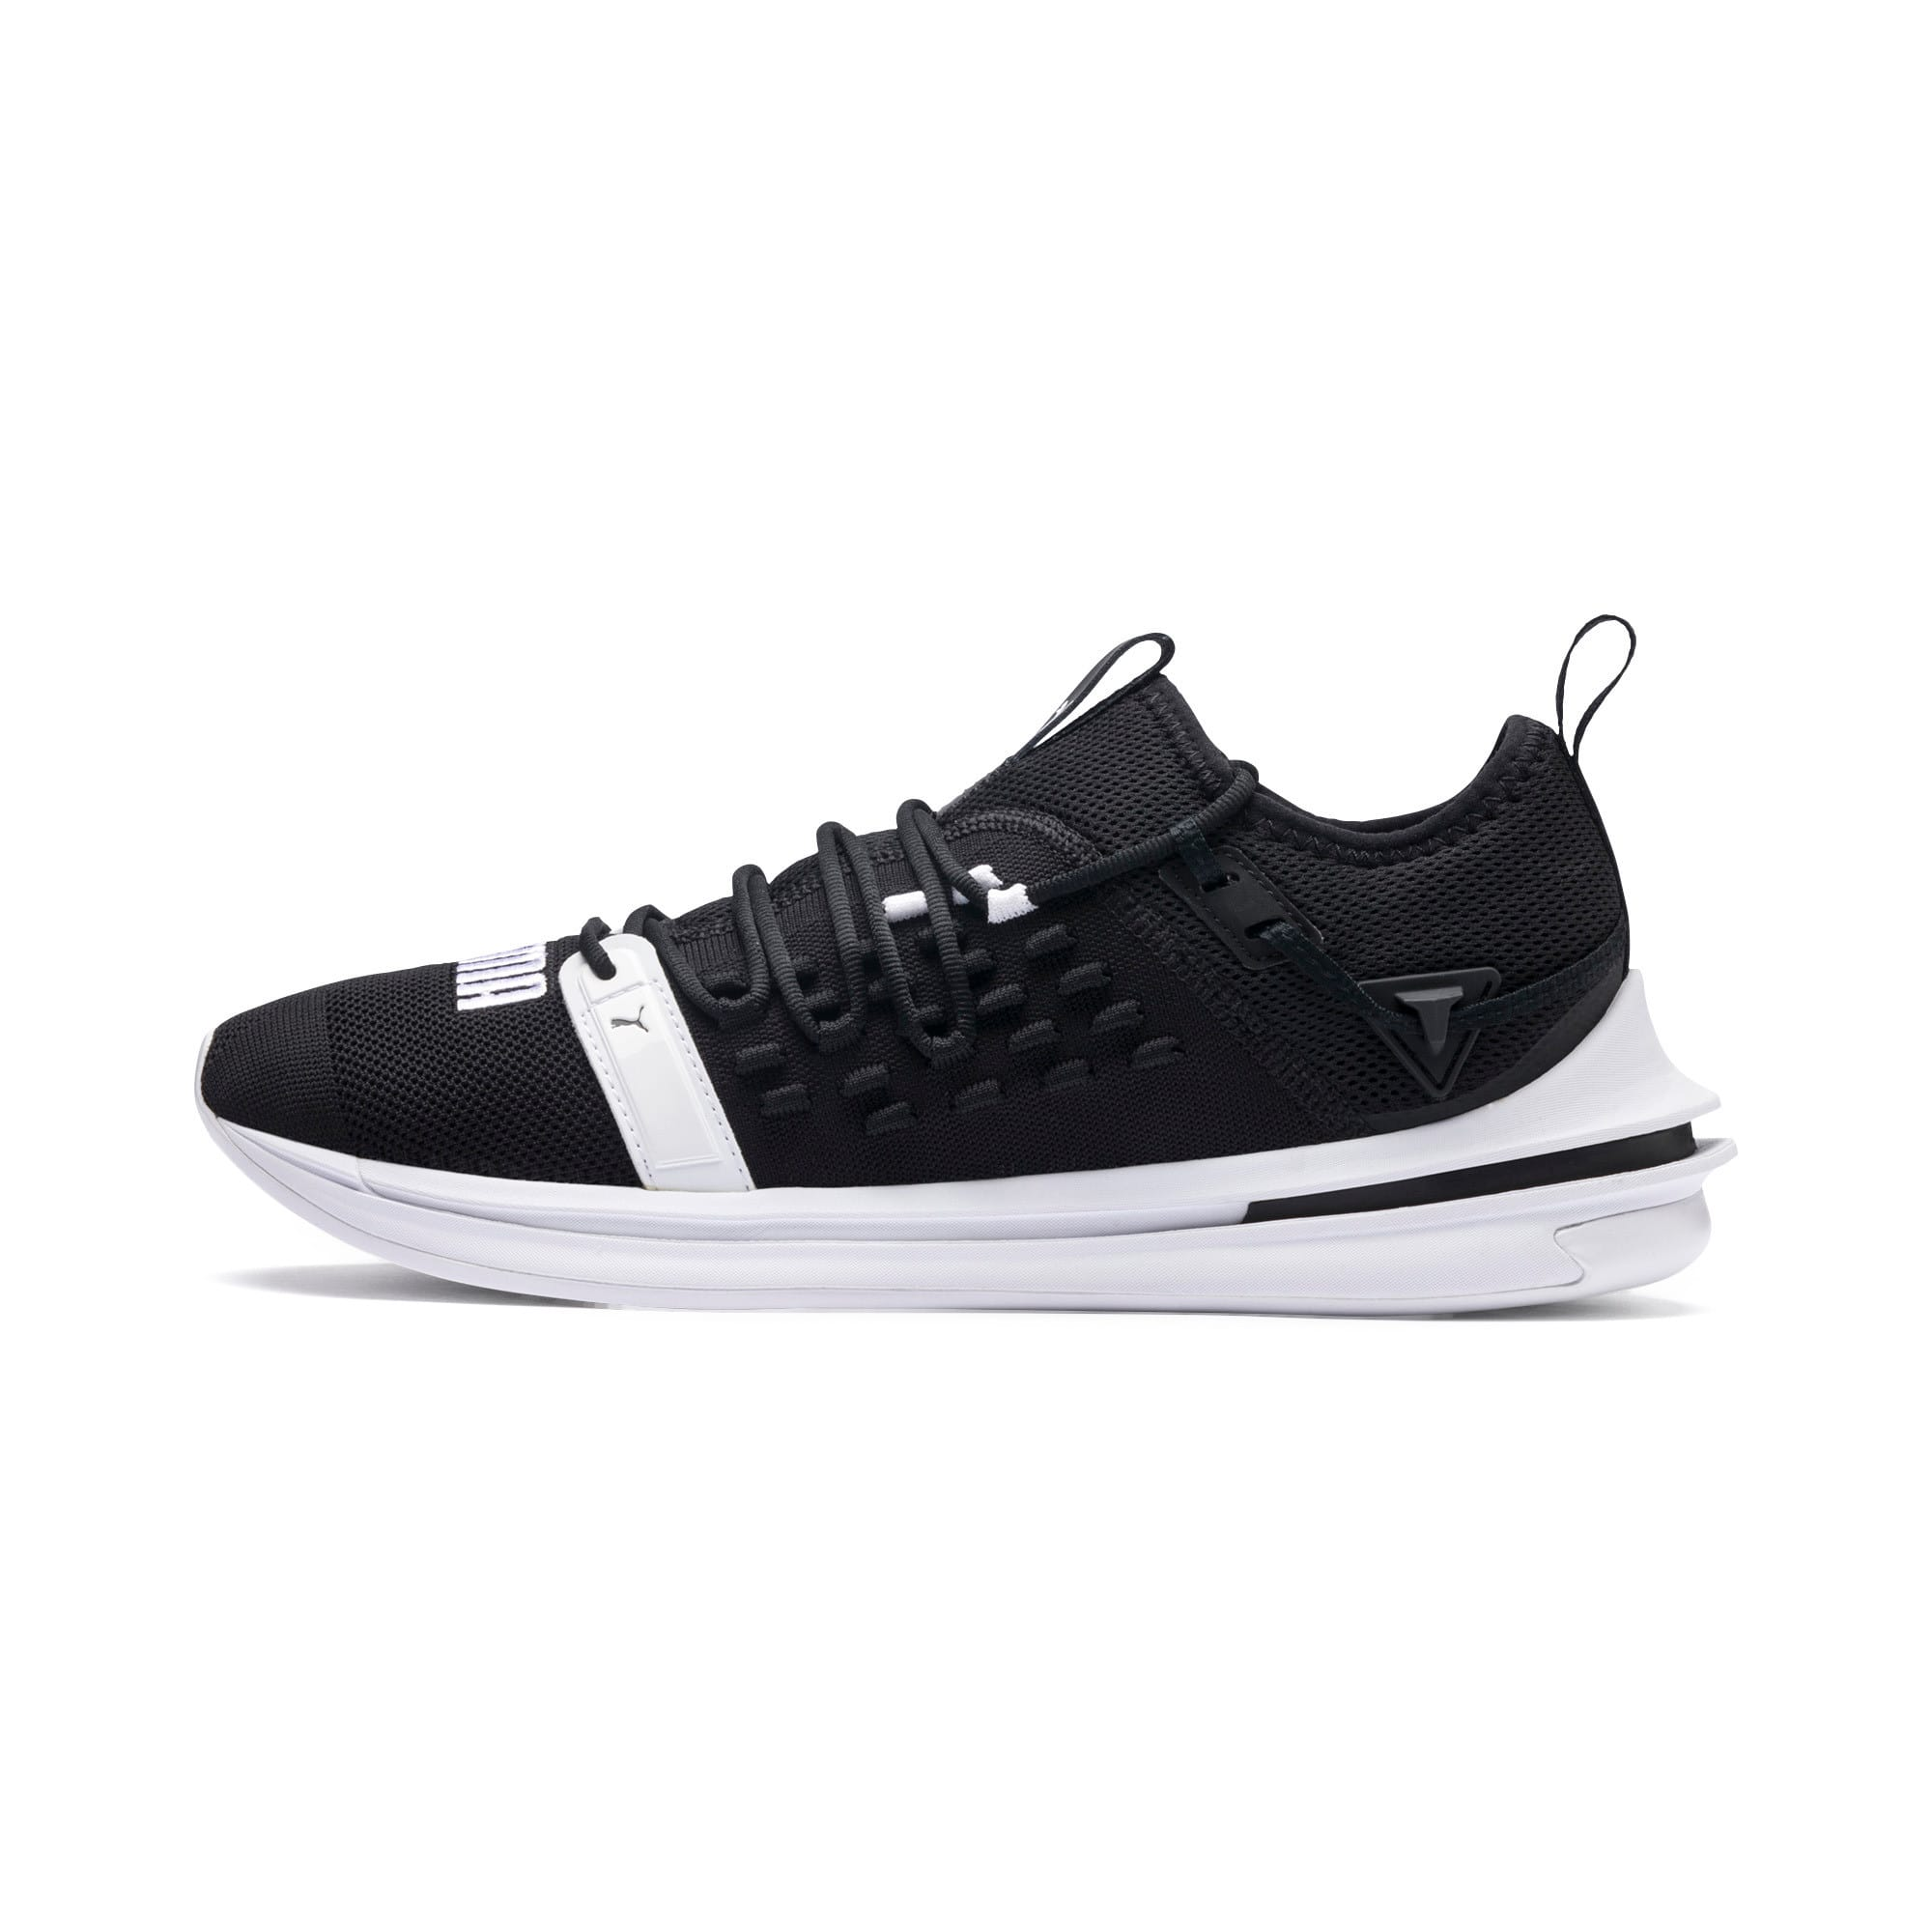 Thumbnail 1 of IGNITE Limitless SR FUSEFIT Running Shoes, Puma Black-Puma White, medium-IND